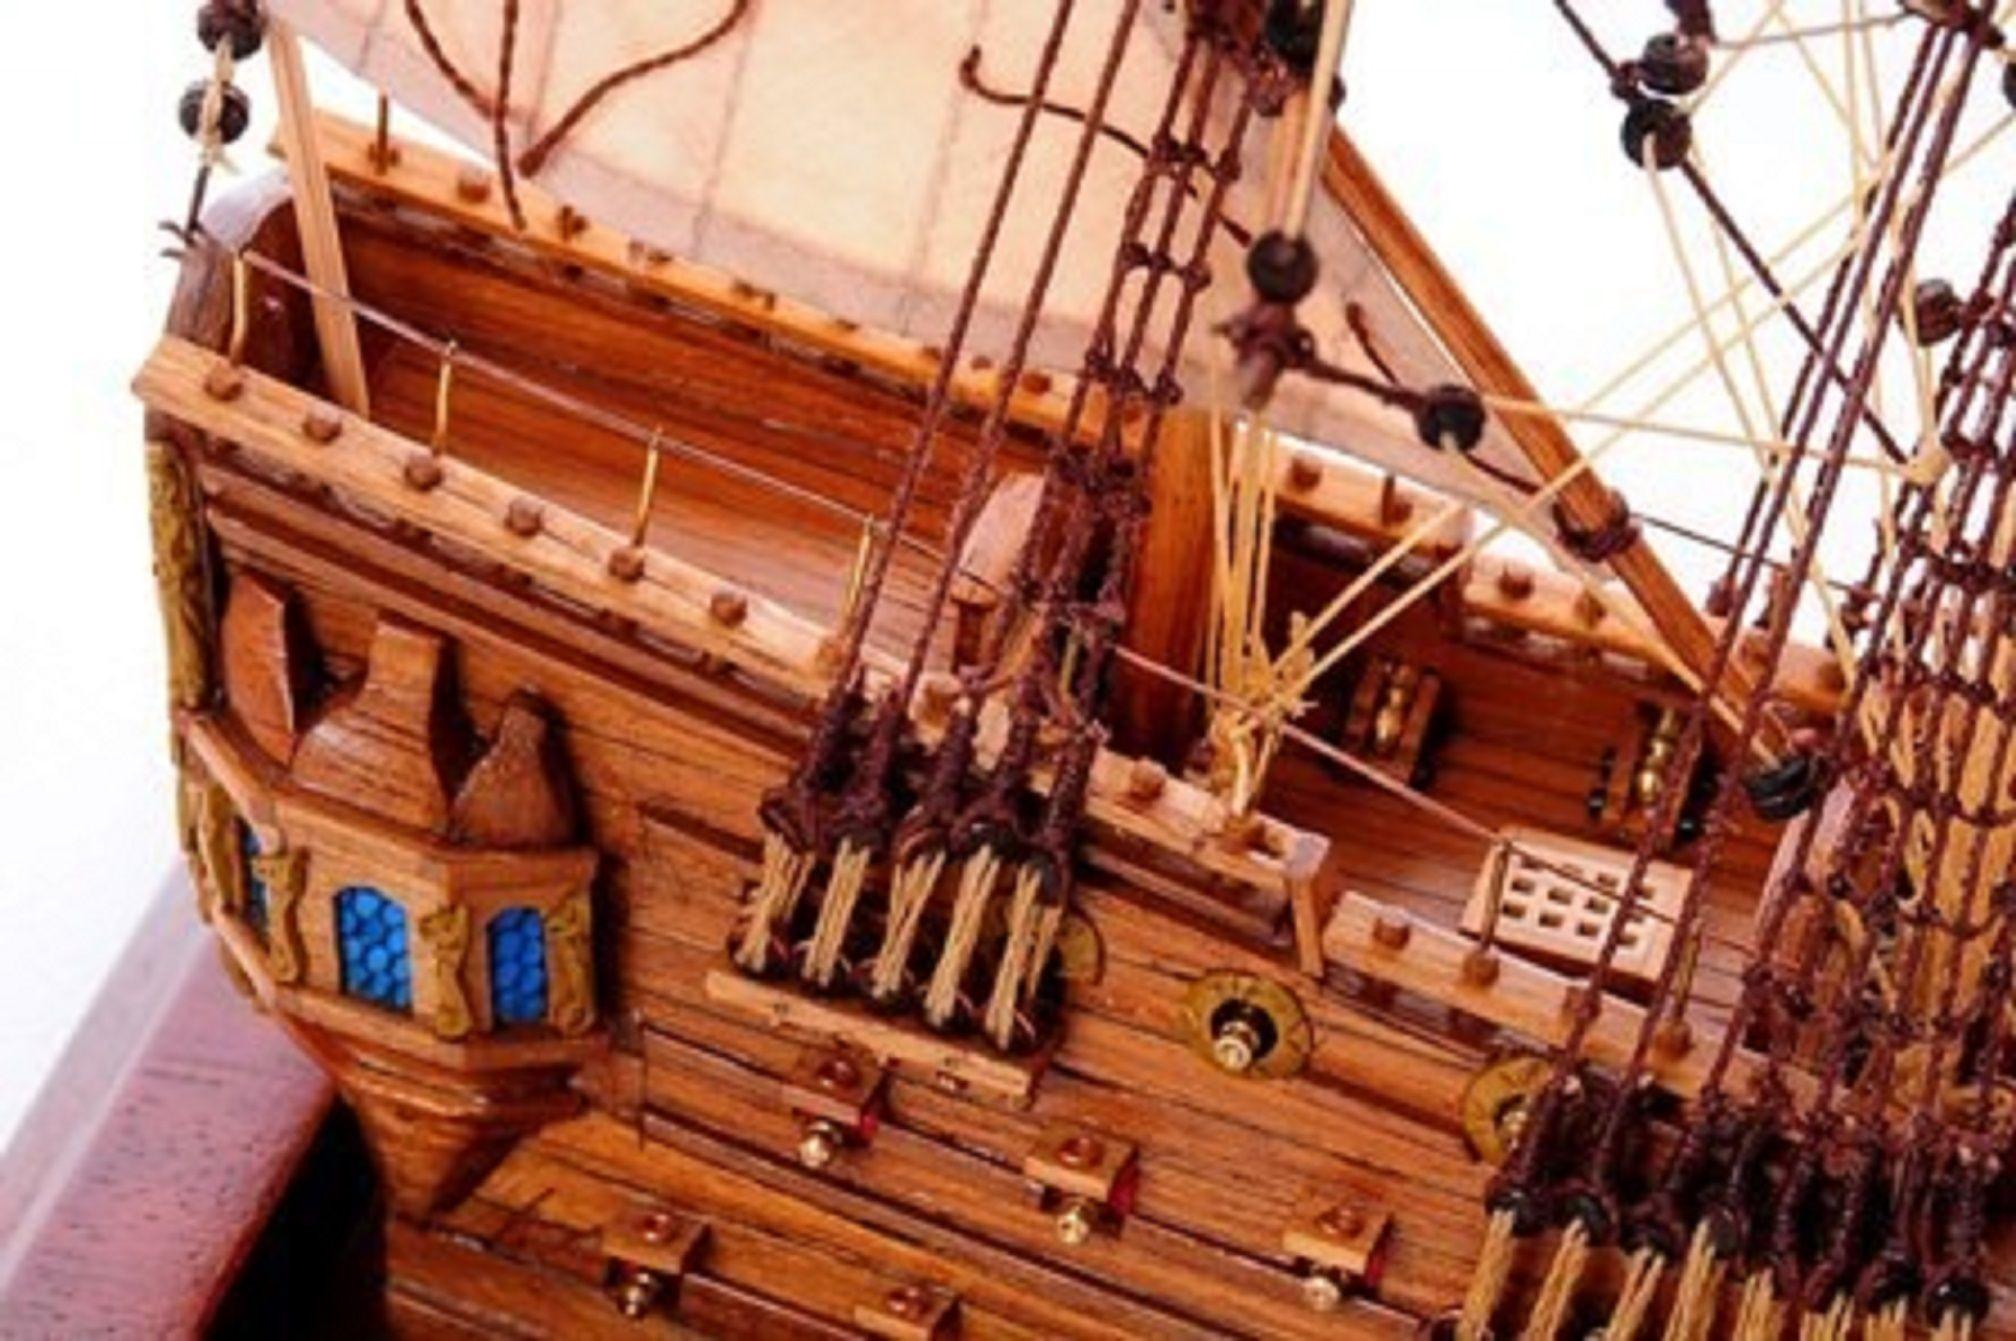 1254-7013-Bristol-Waterline-Model-Ship-Premier-Range